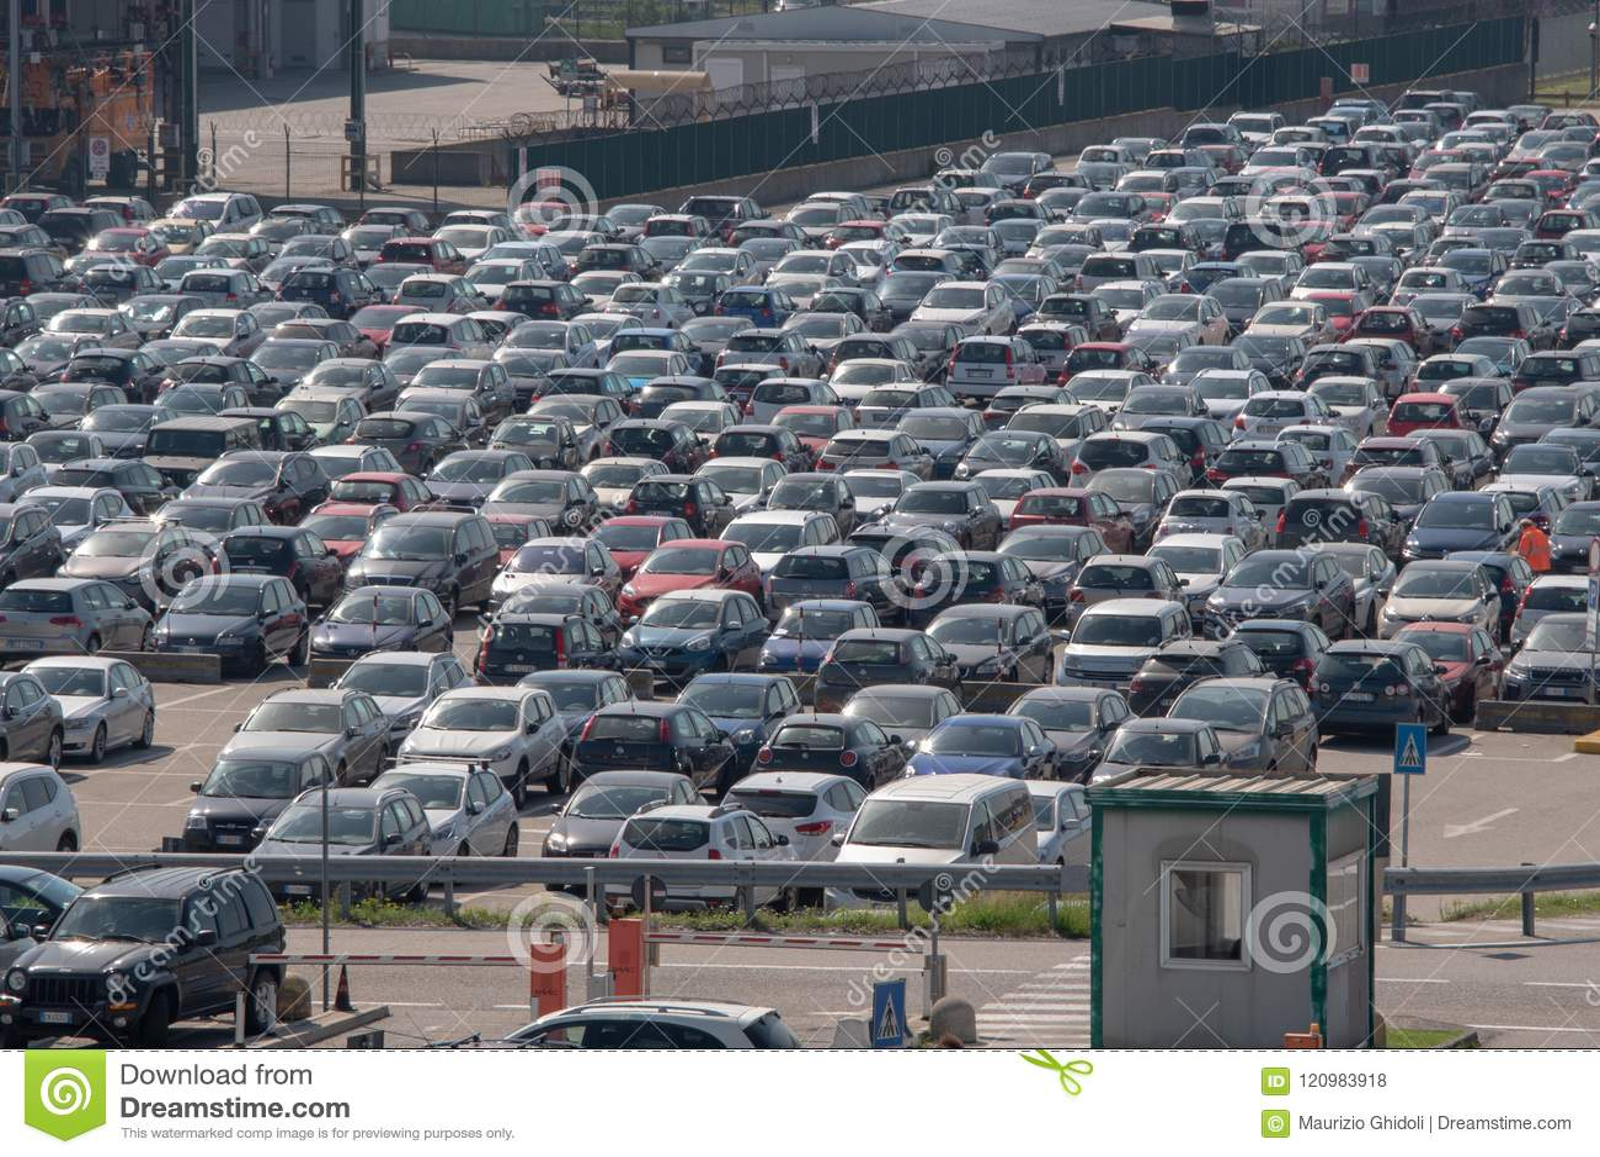 123c8f48 Milan: The Car Park Of Malpensa Airport Editorial Stock Photo ...